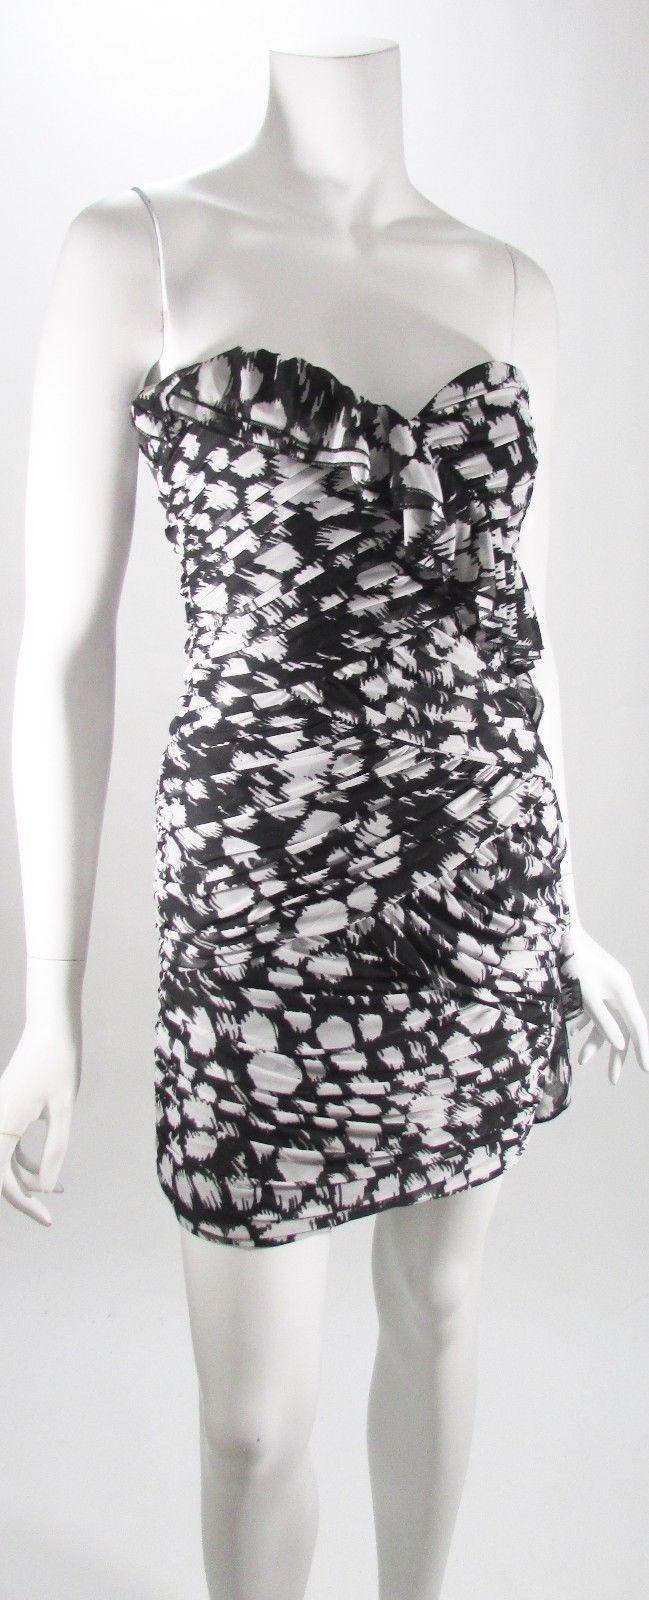 71a8df08de862 Max & Cleo Black & White Strapless Side Ruffle Mini Cocktail Dress ...